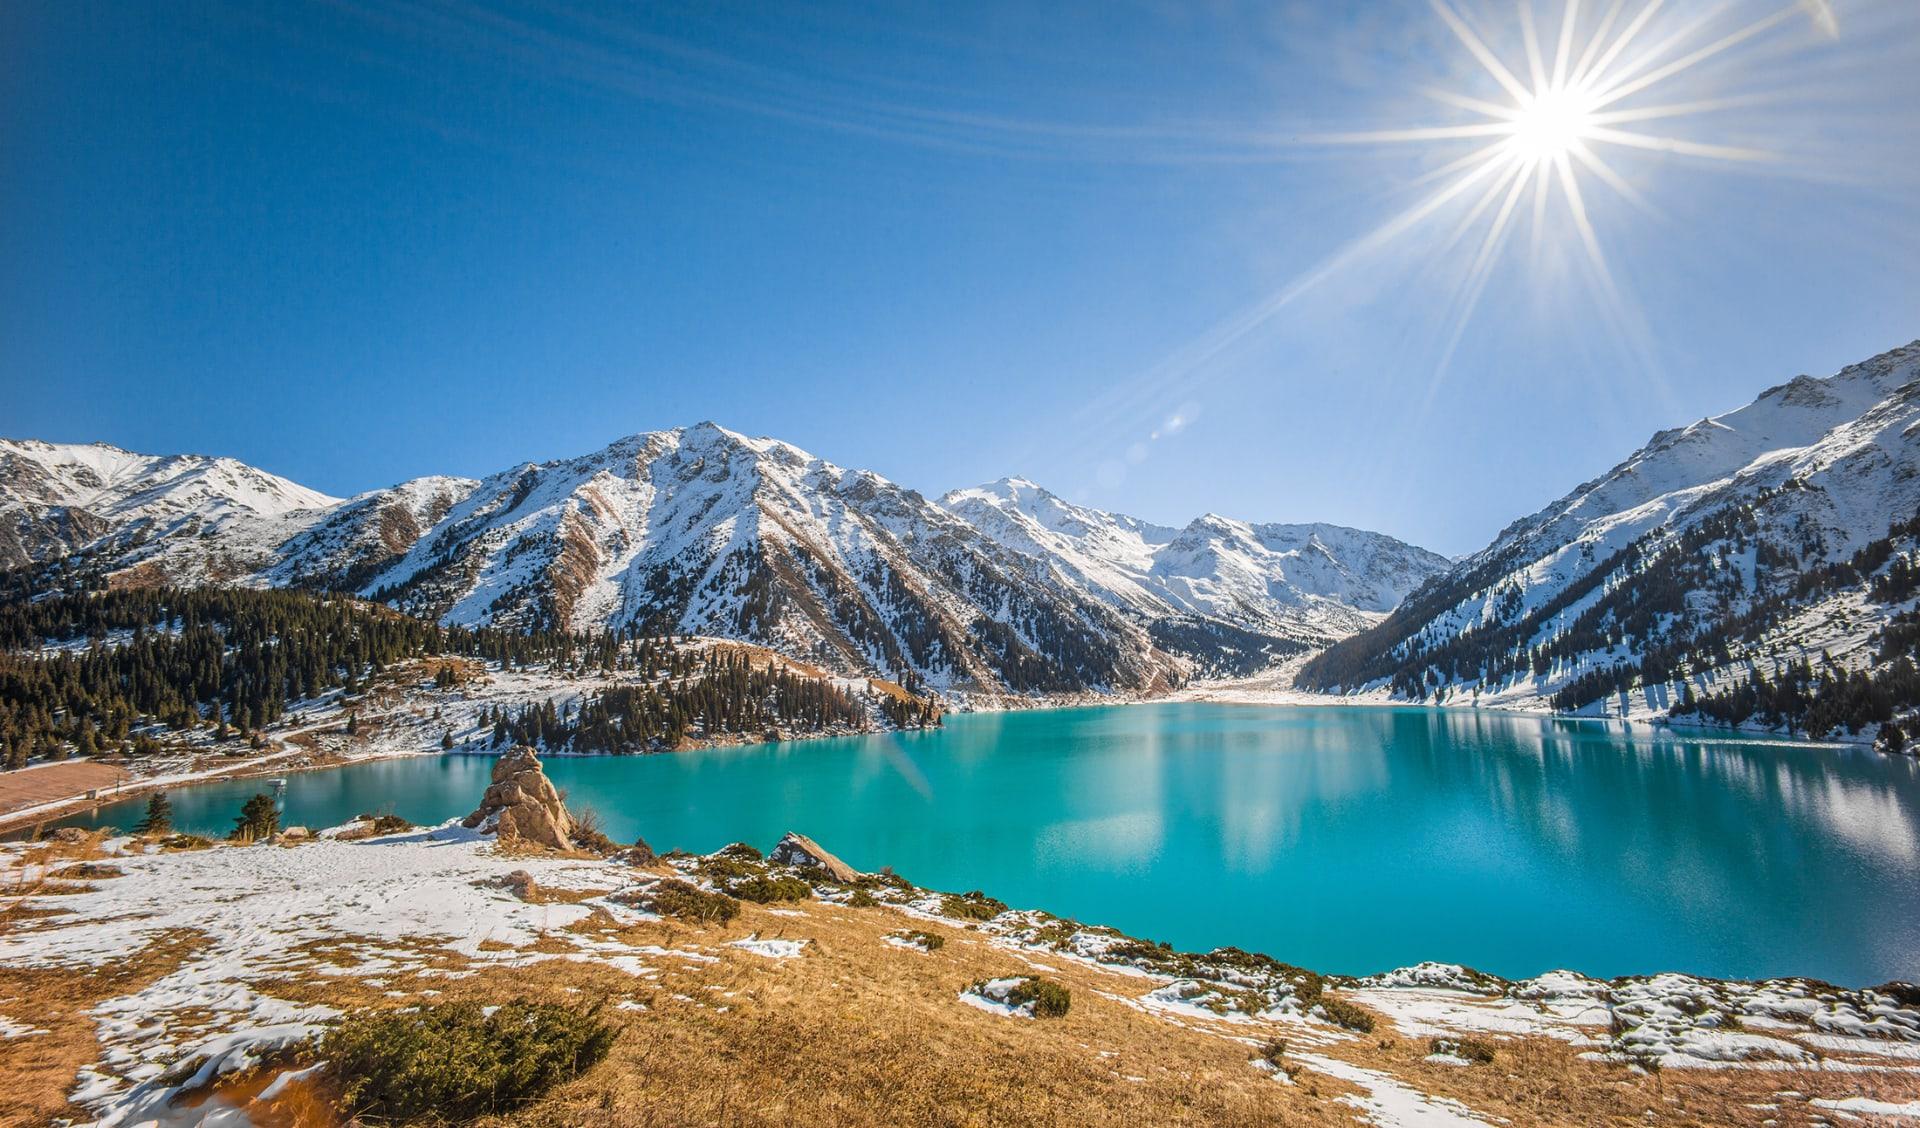 Tien Shan Gebirge, Almaty, Kasachstan